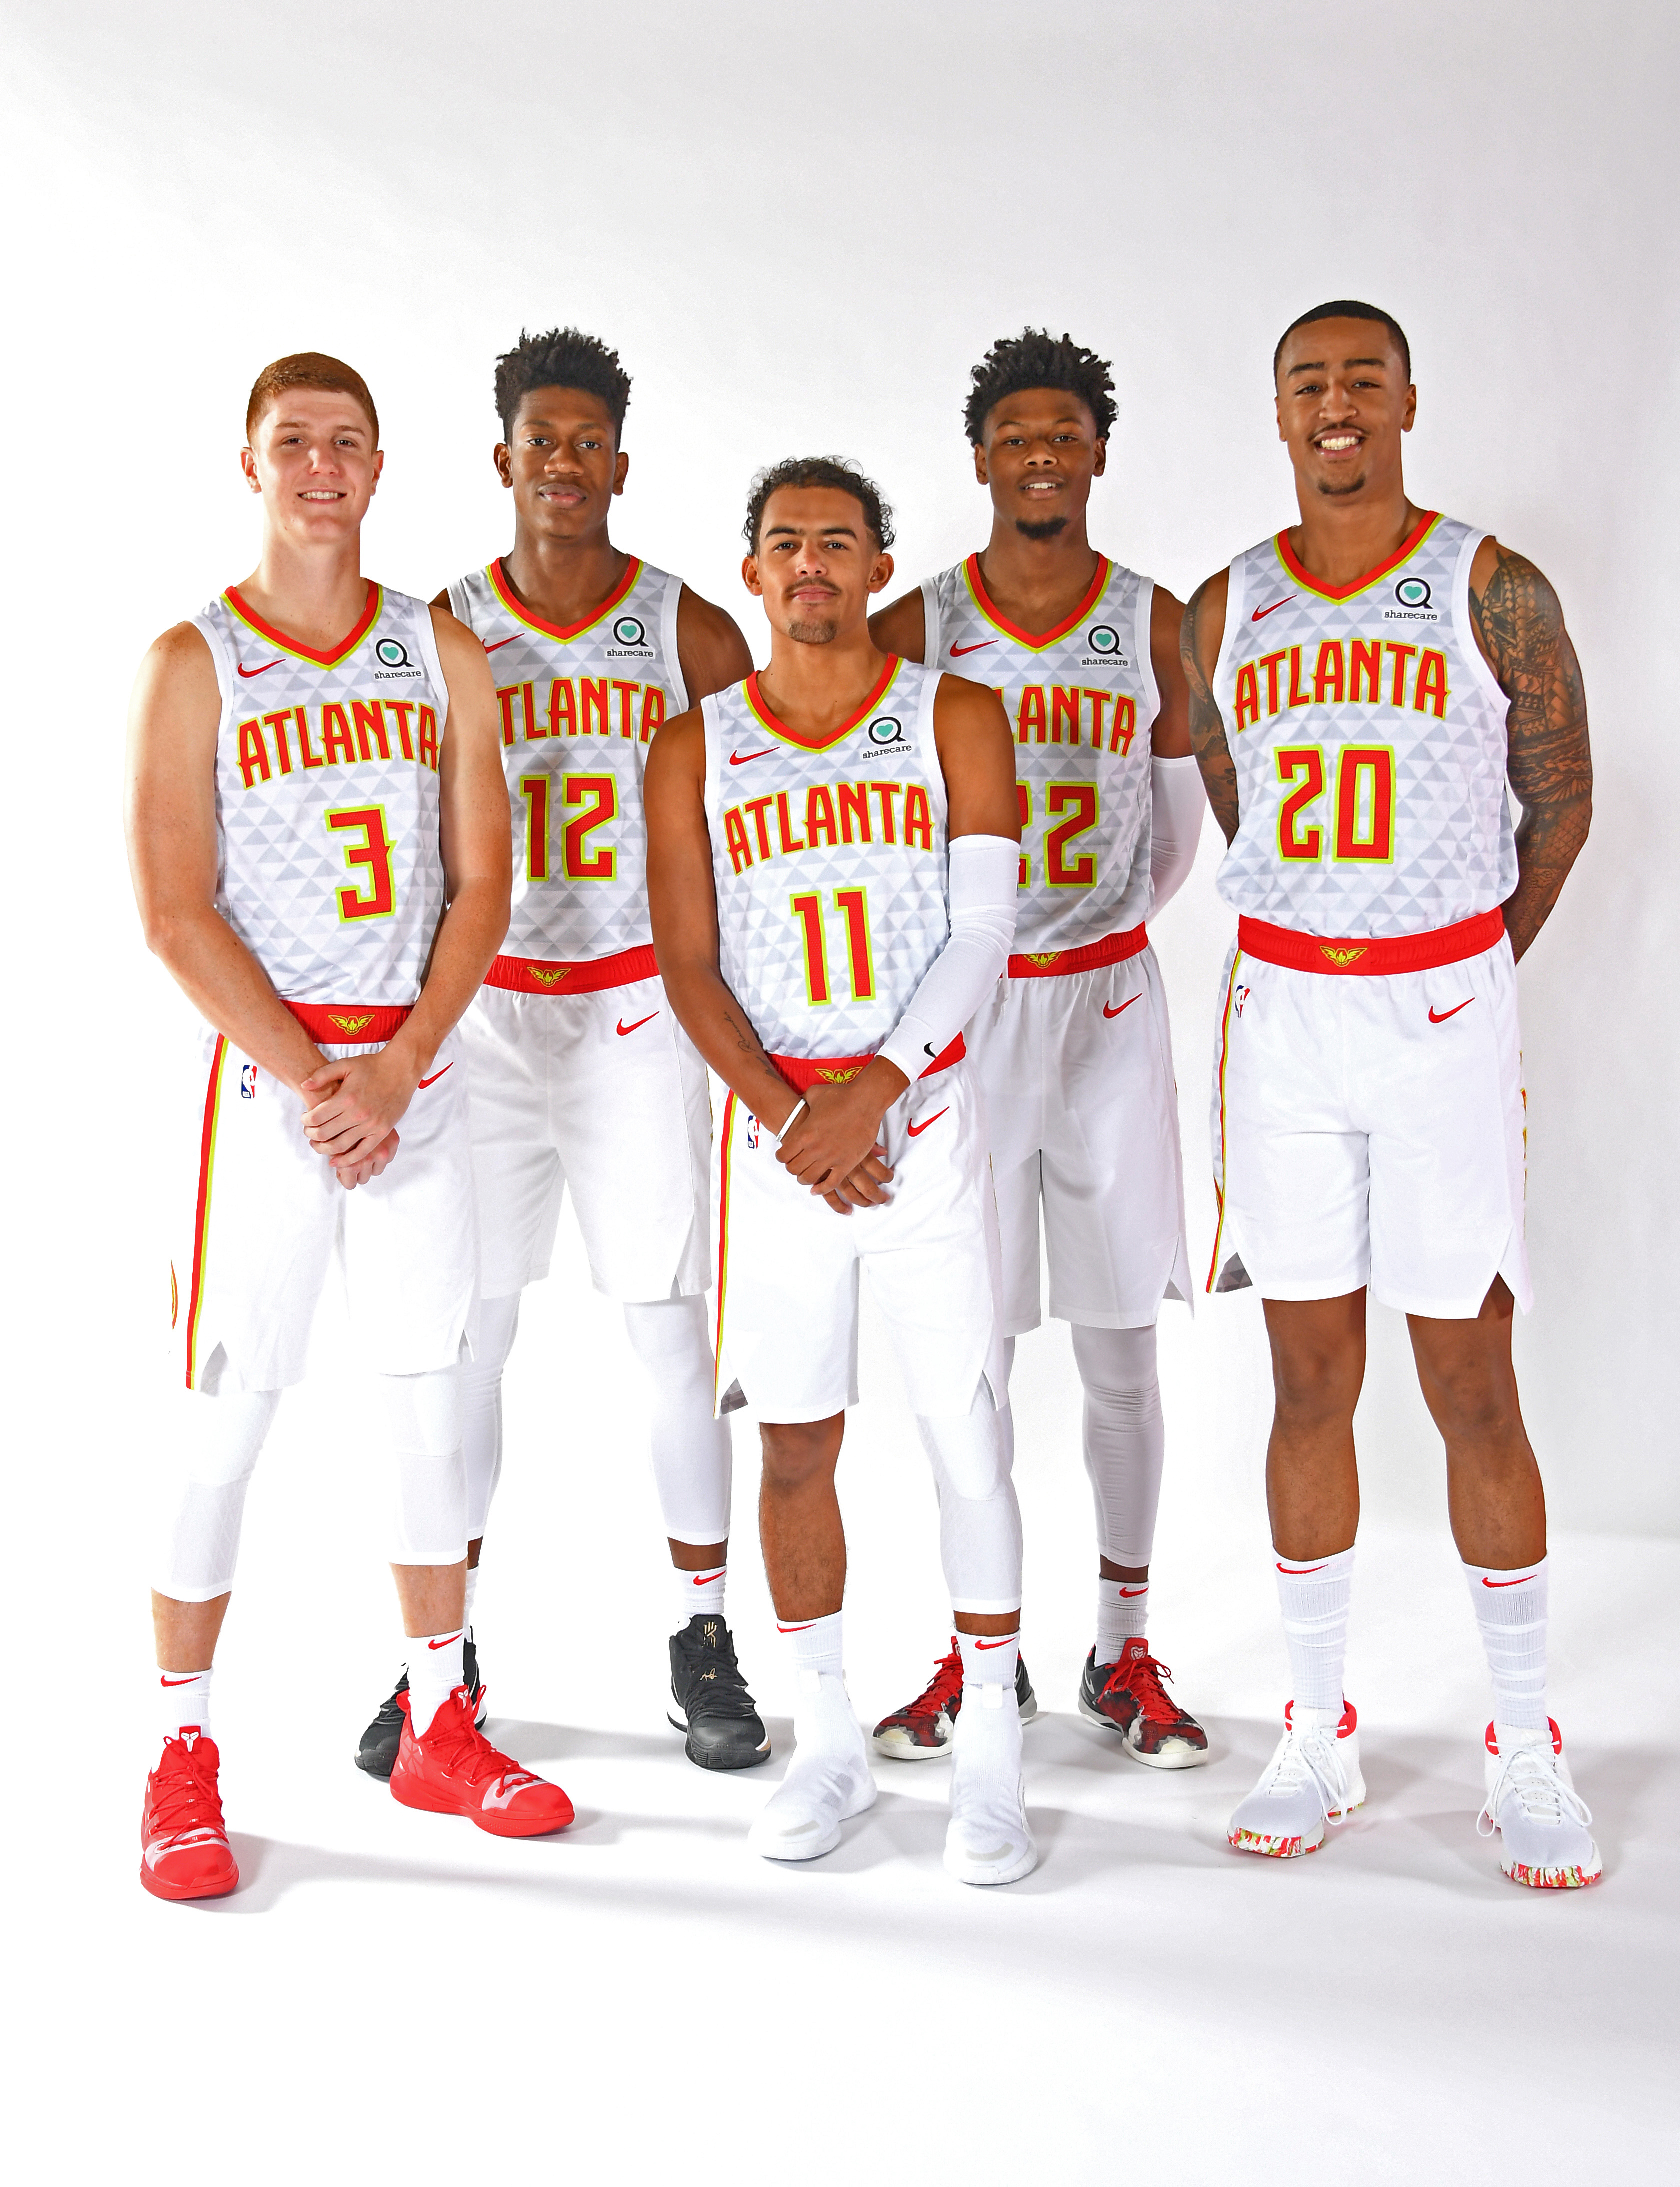 2019-20 Atlanta Hawks Media Day